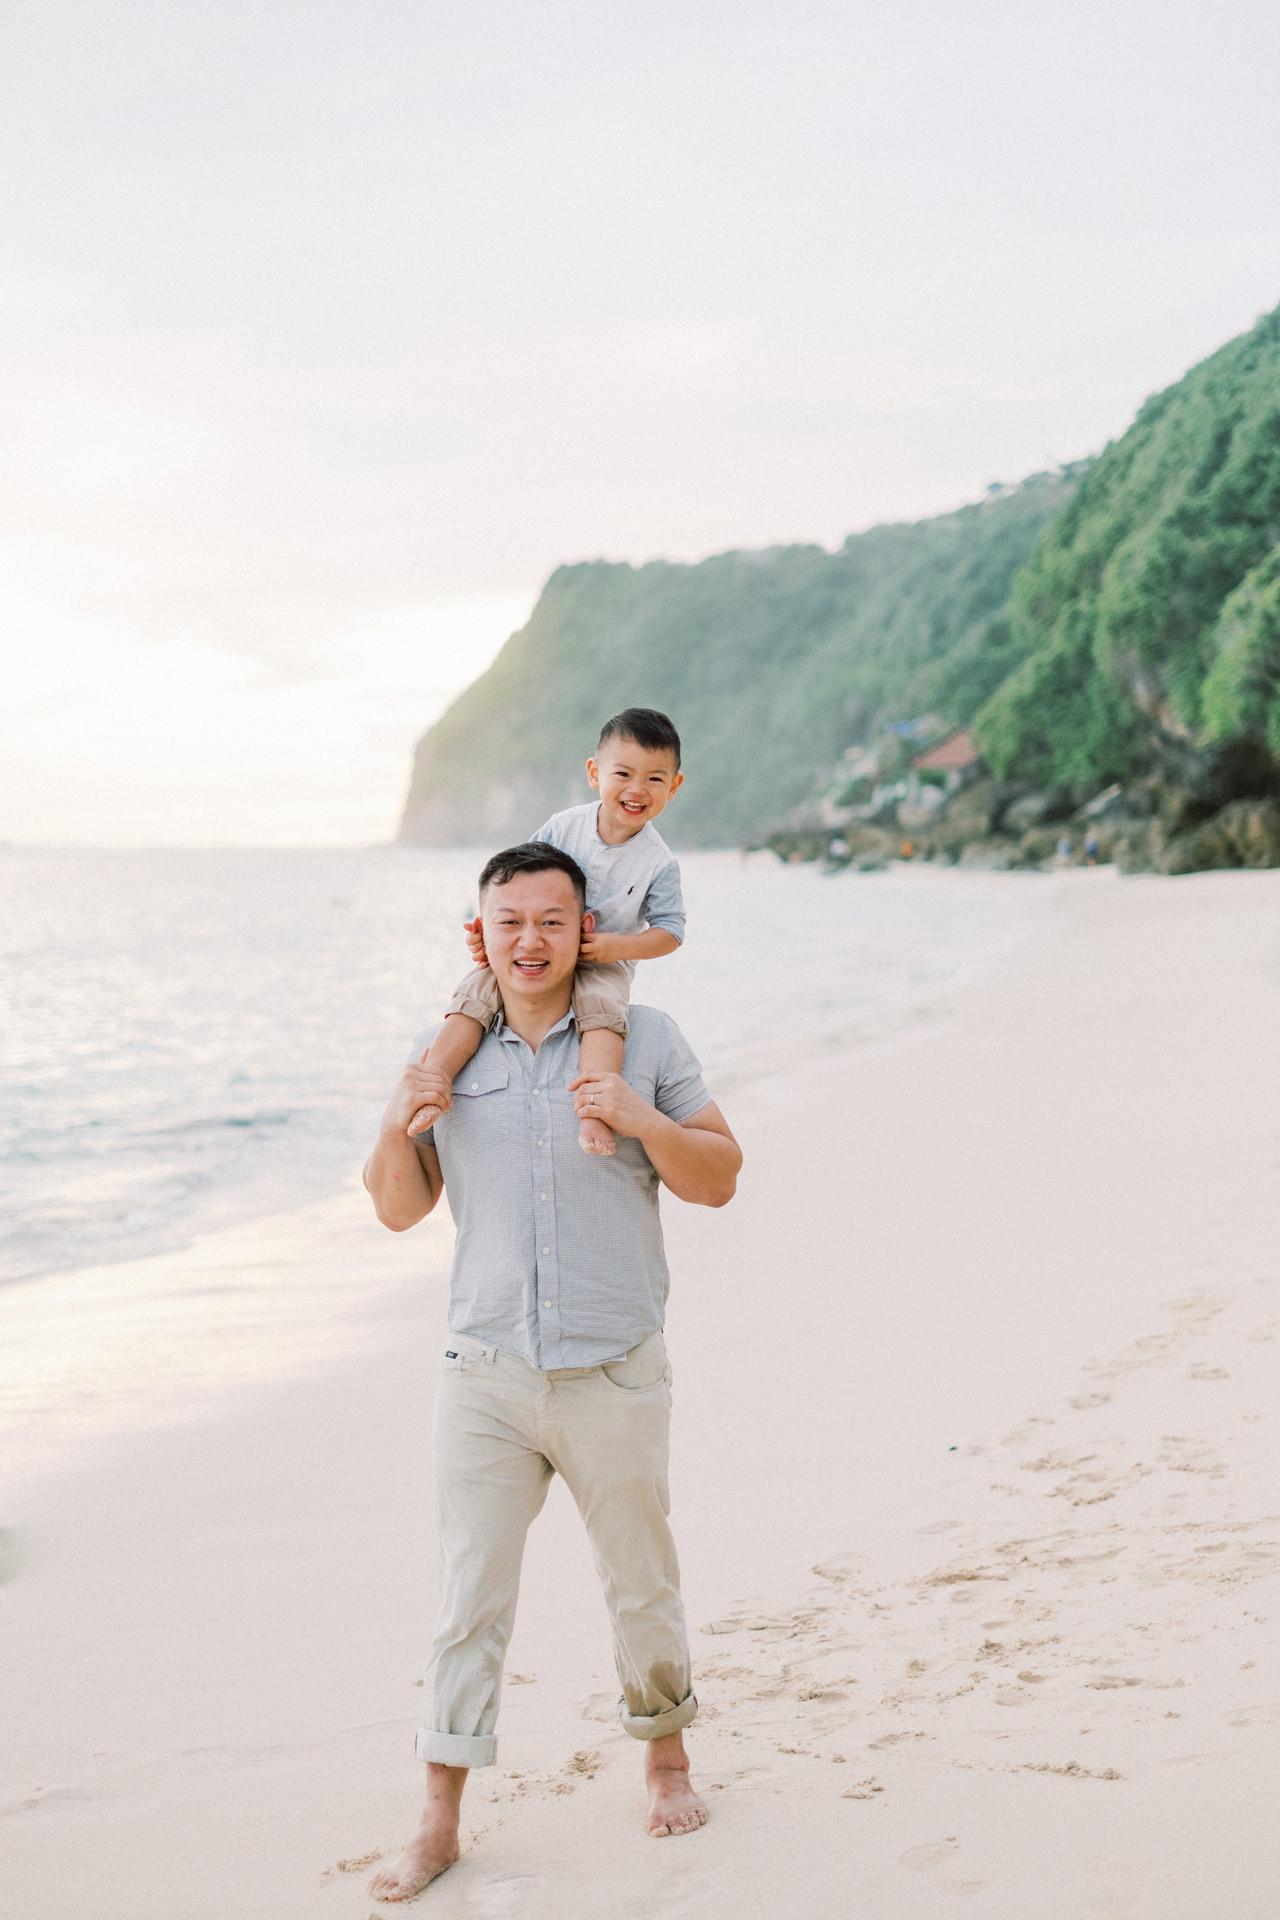 H&M: Bali Family Photo Session 6